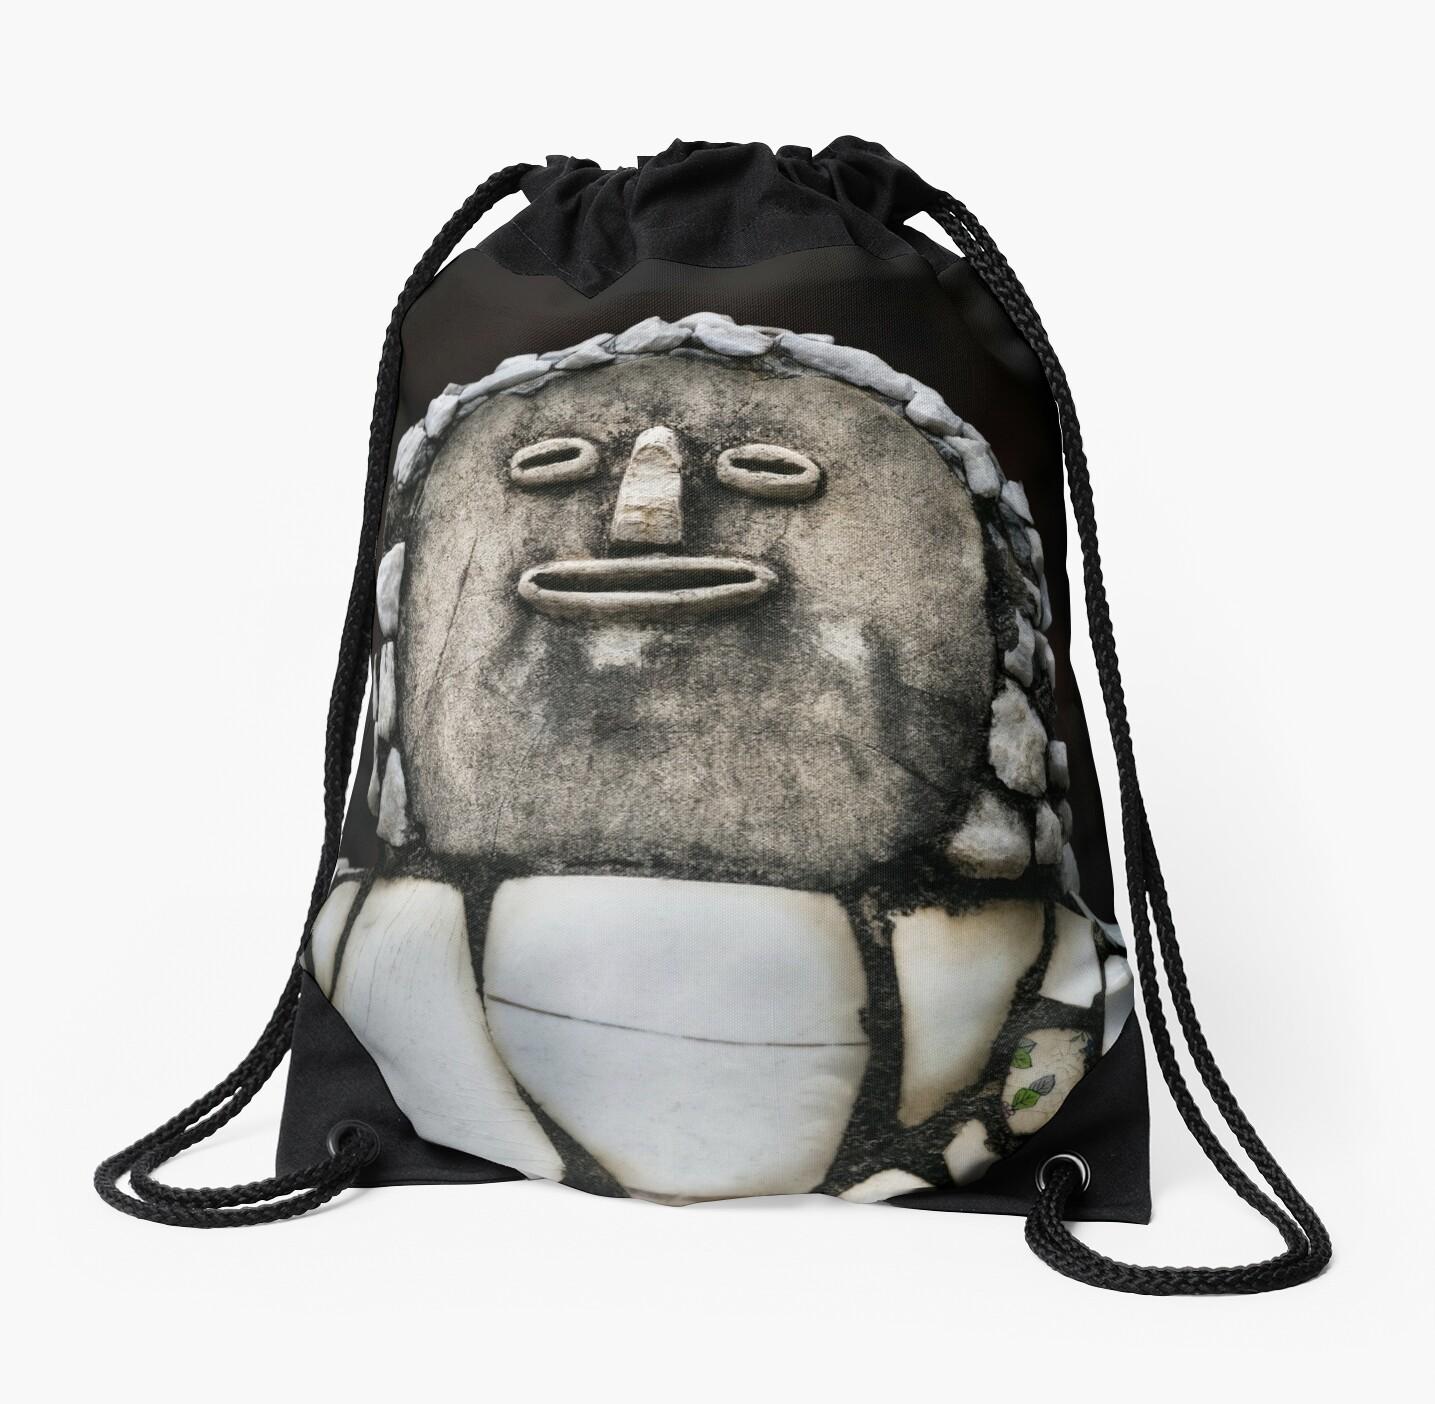 Nek Chand Fantasy 5 - DRAWSTRING BAG by Glen Allison